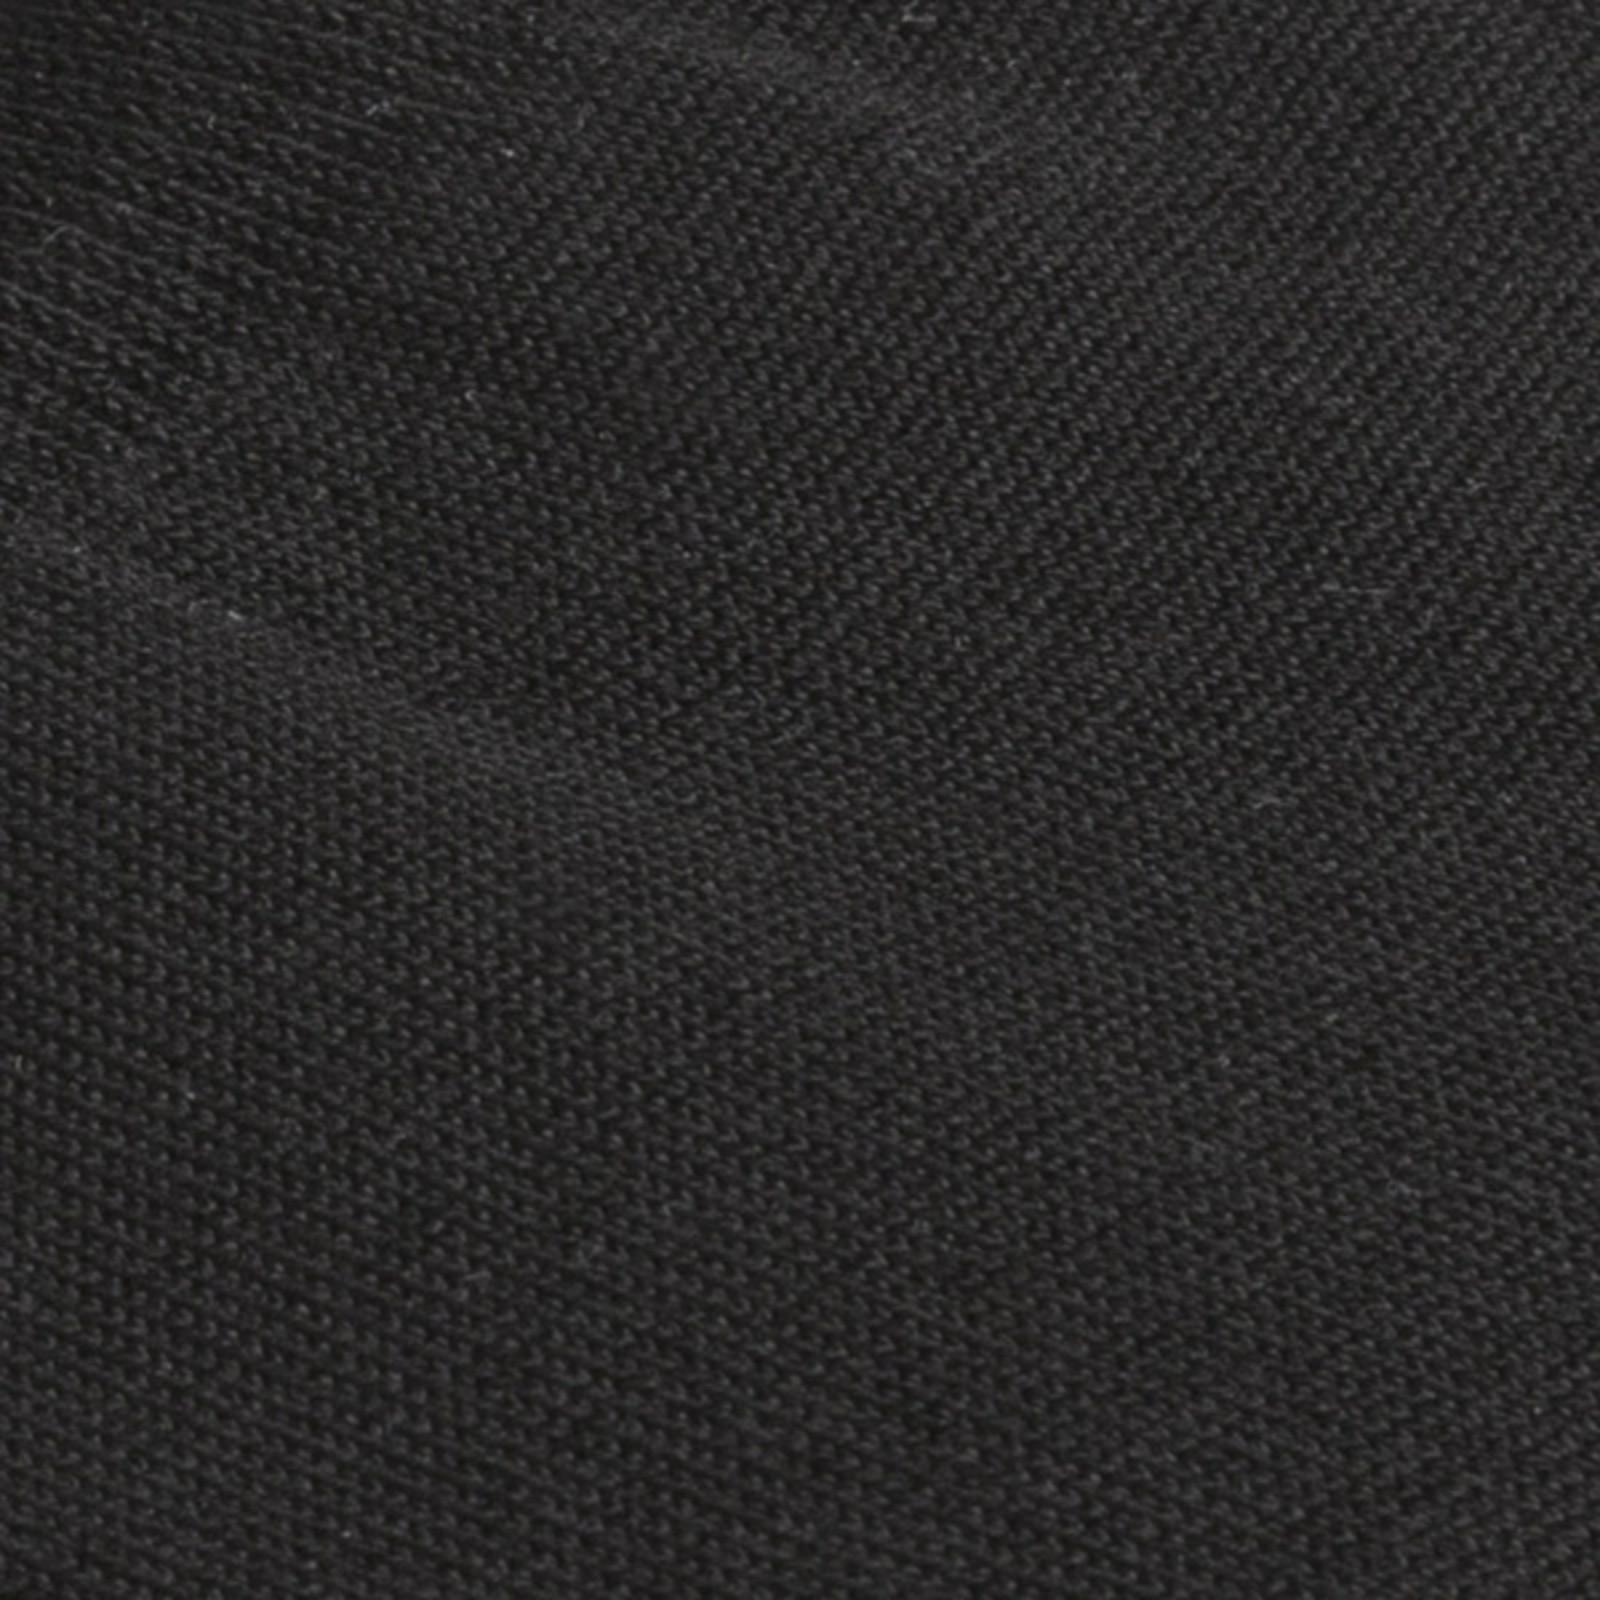 Carlo Lanza Anthrazitfarbenen Socken Baumwolle